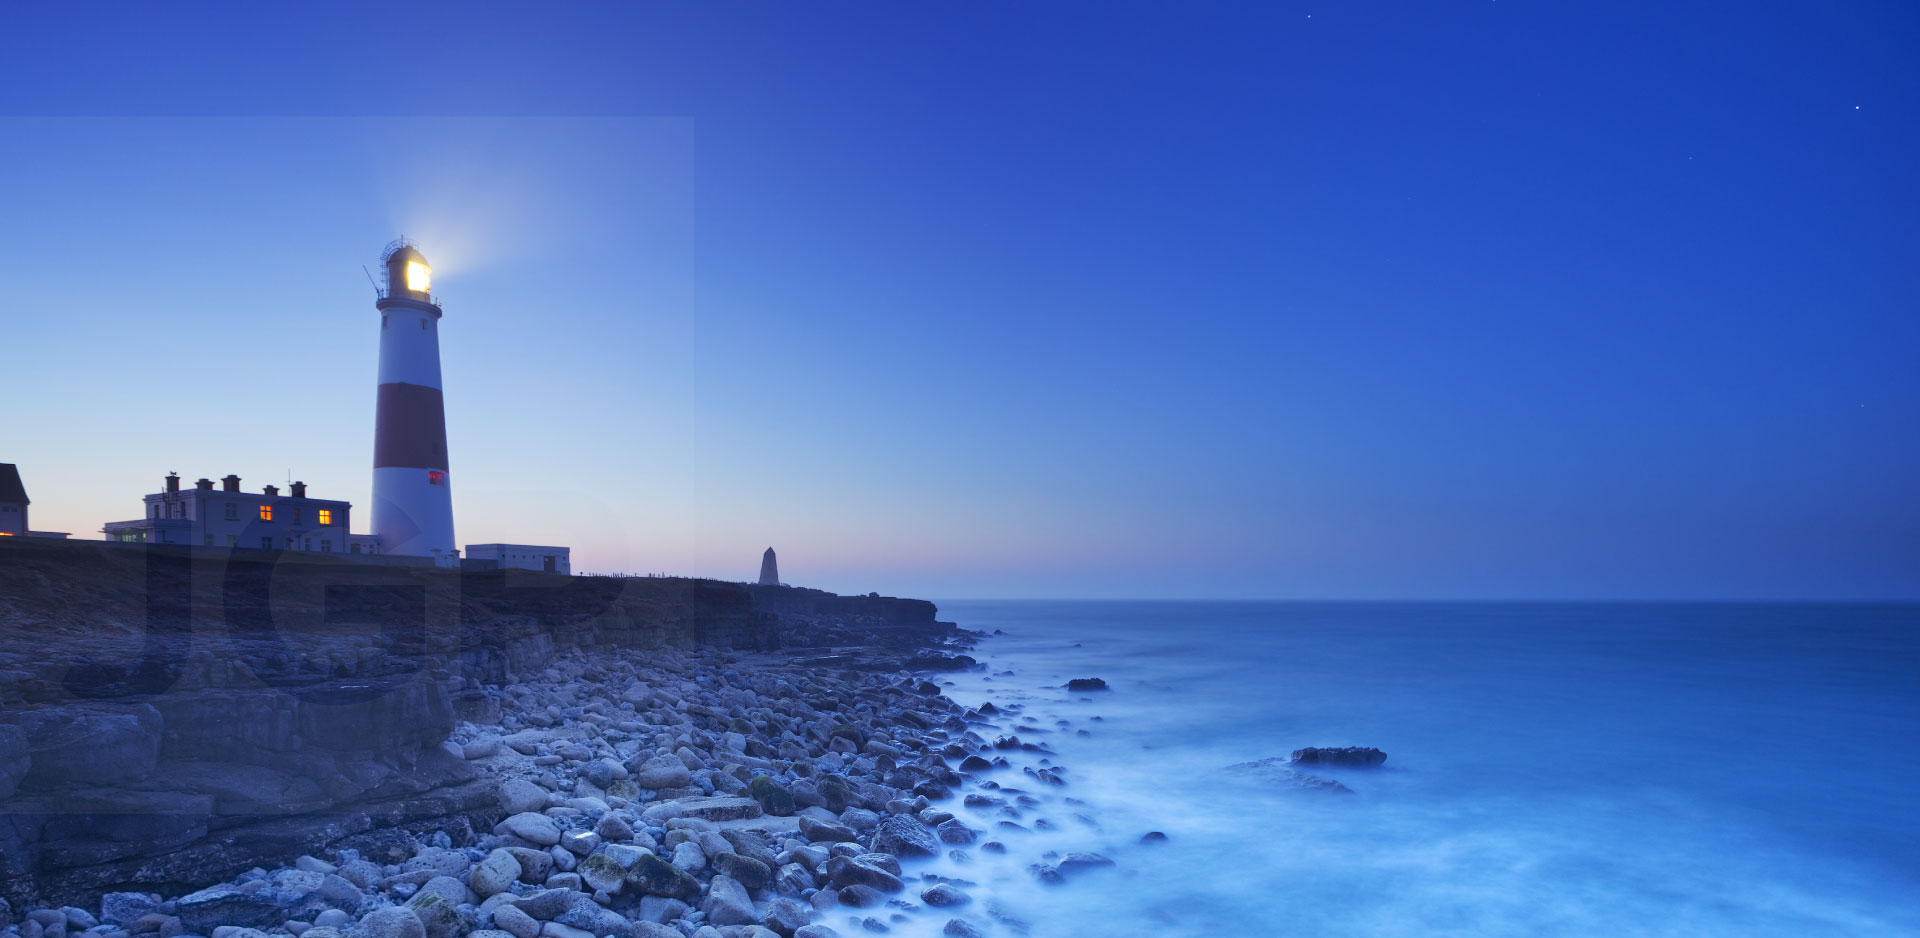 Lighthouse overlooking the sea